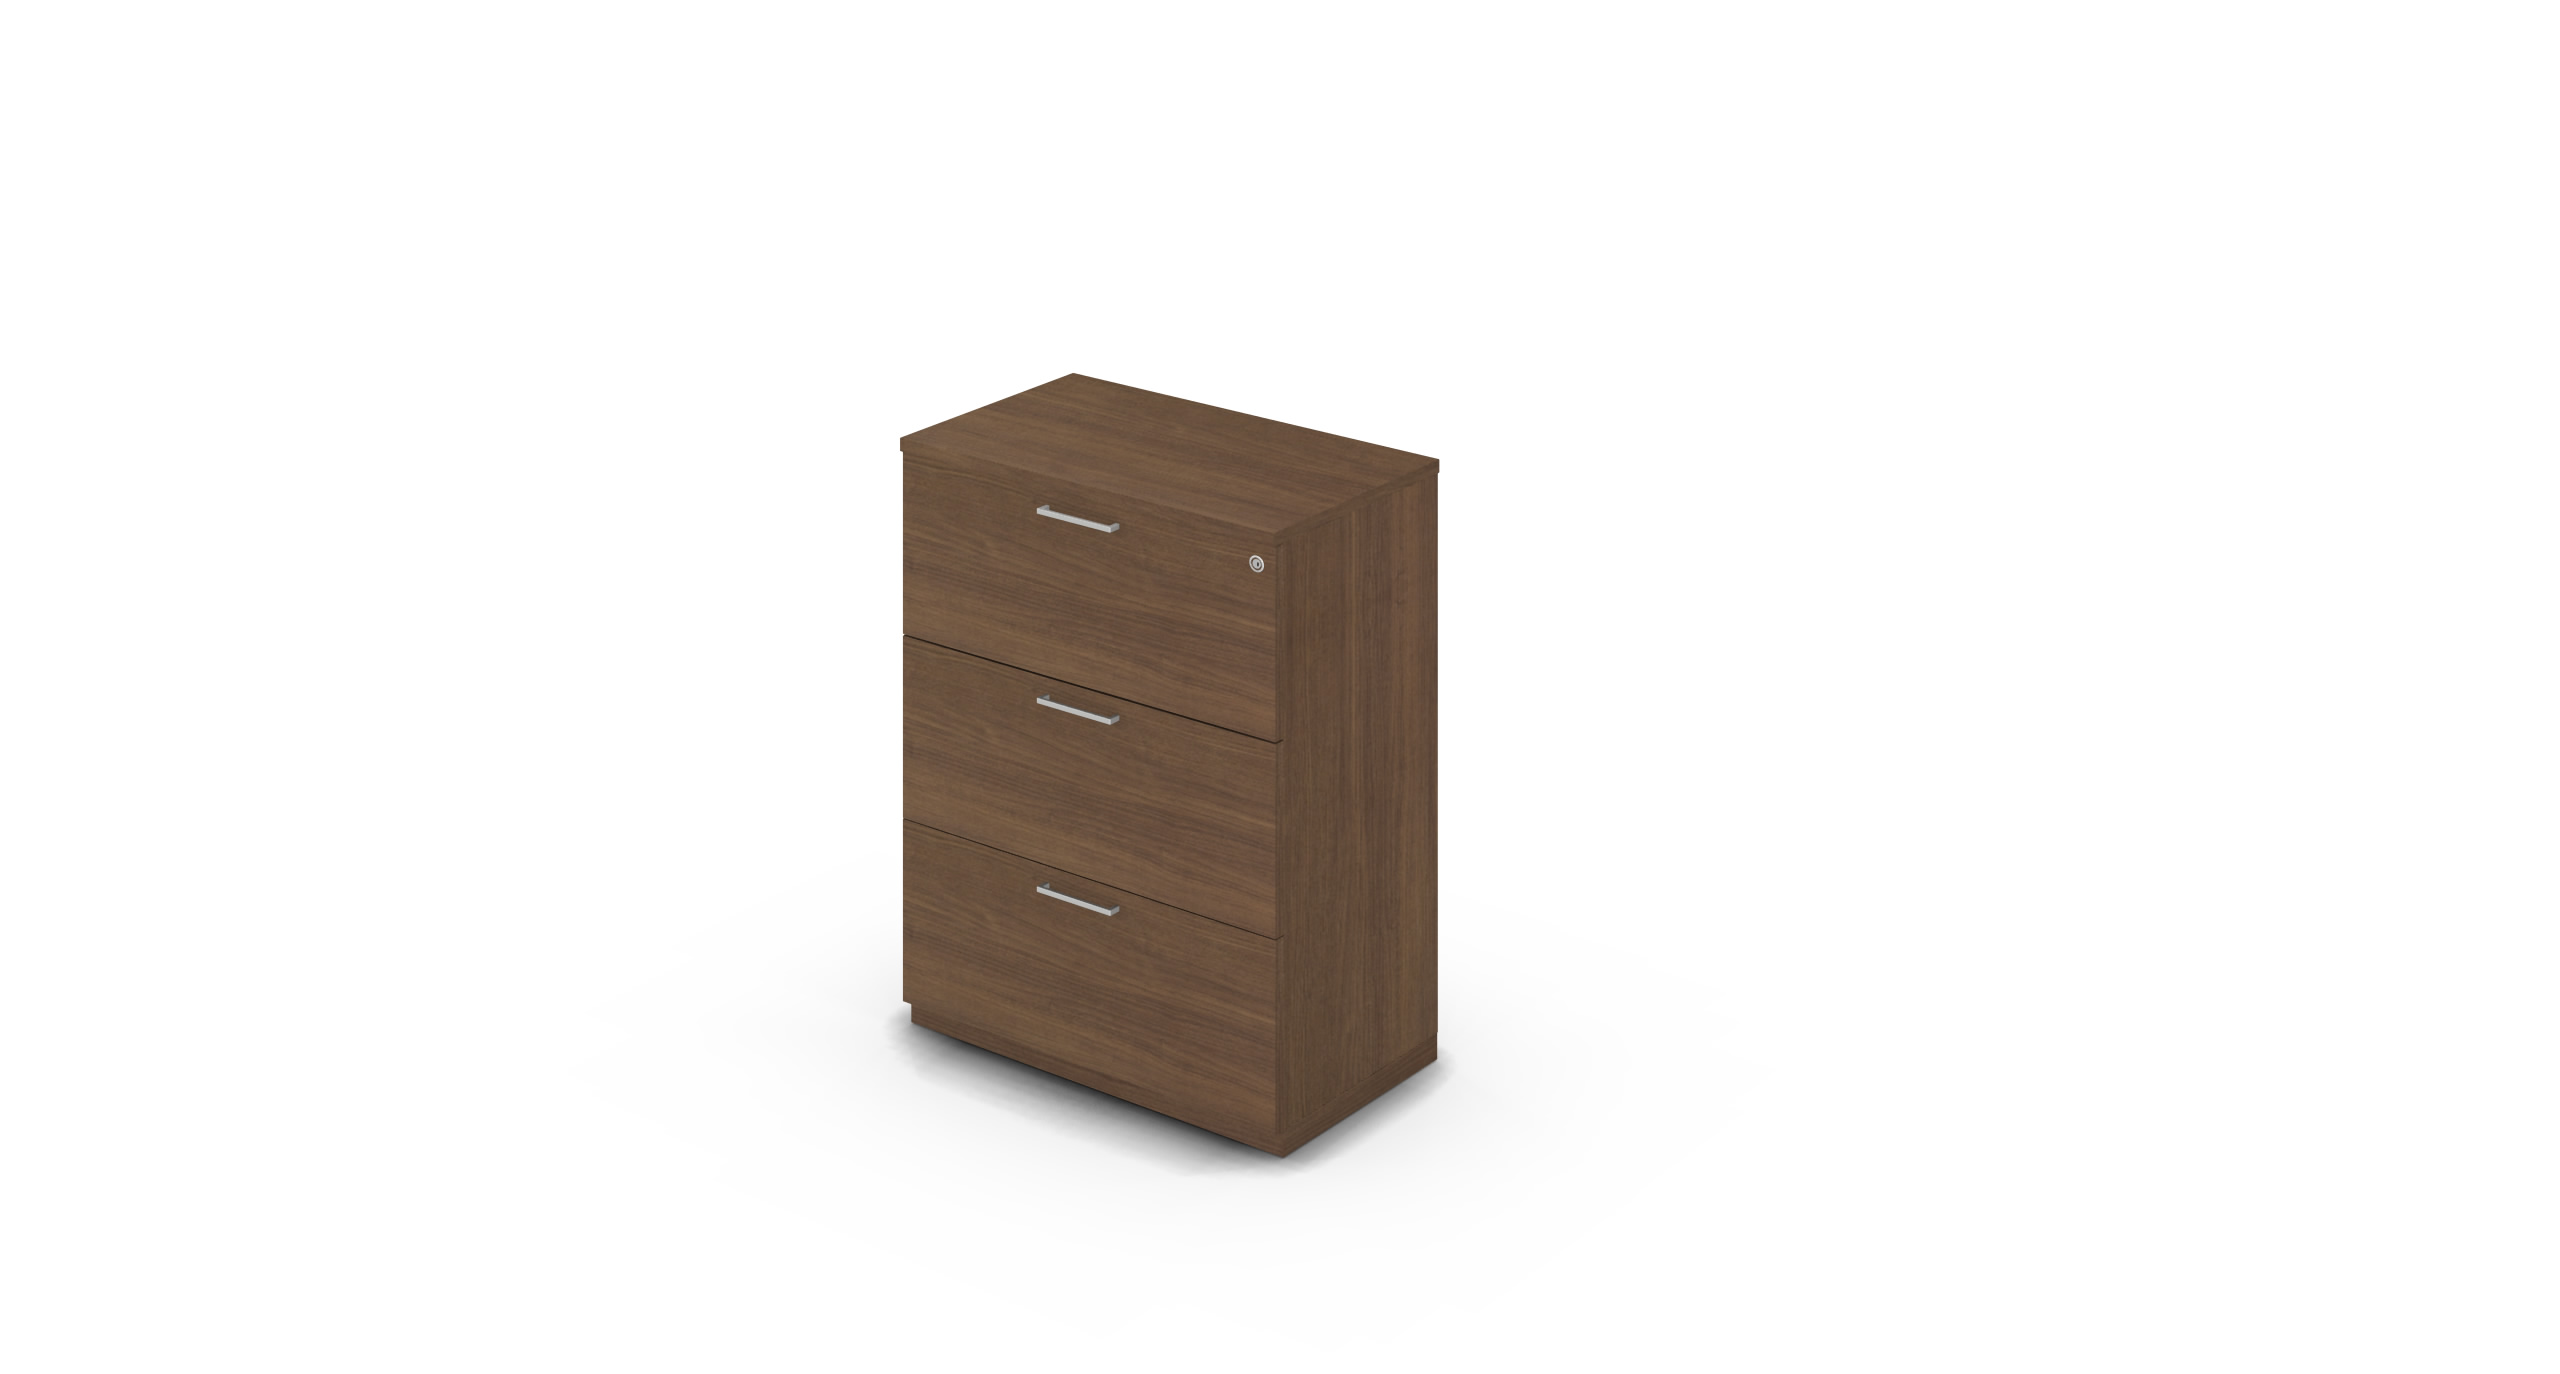 Cabinet_800x450x1125_DR_Walnut_Bar_Square_WithCylinder